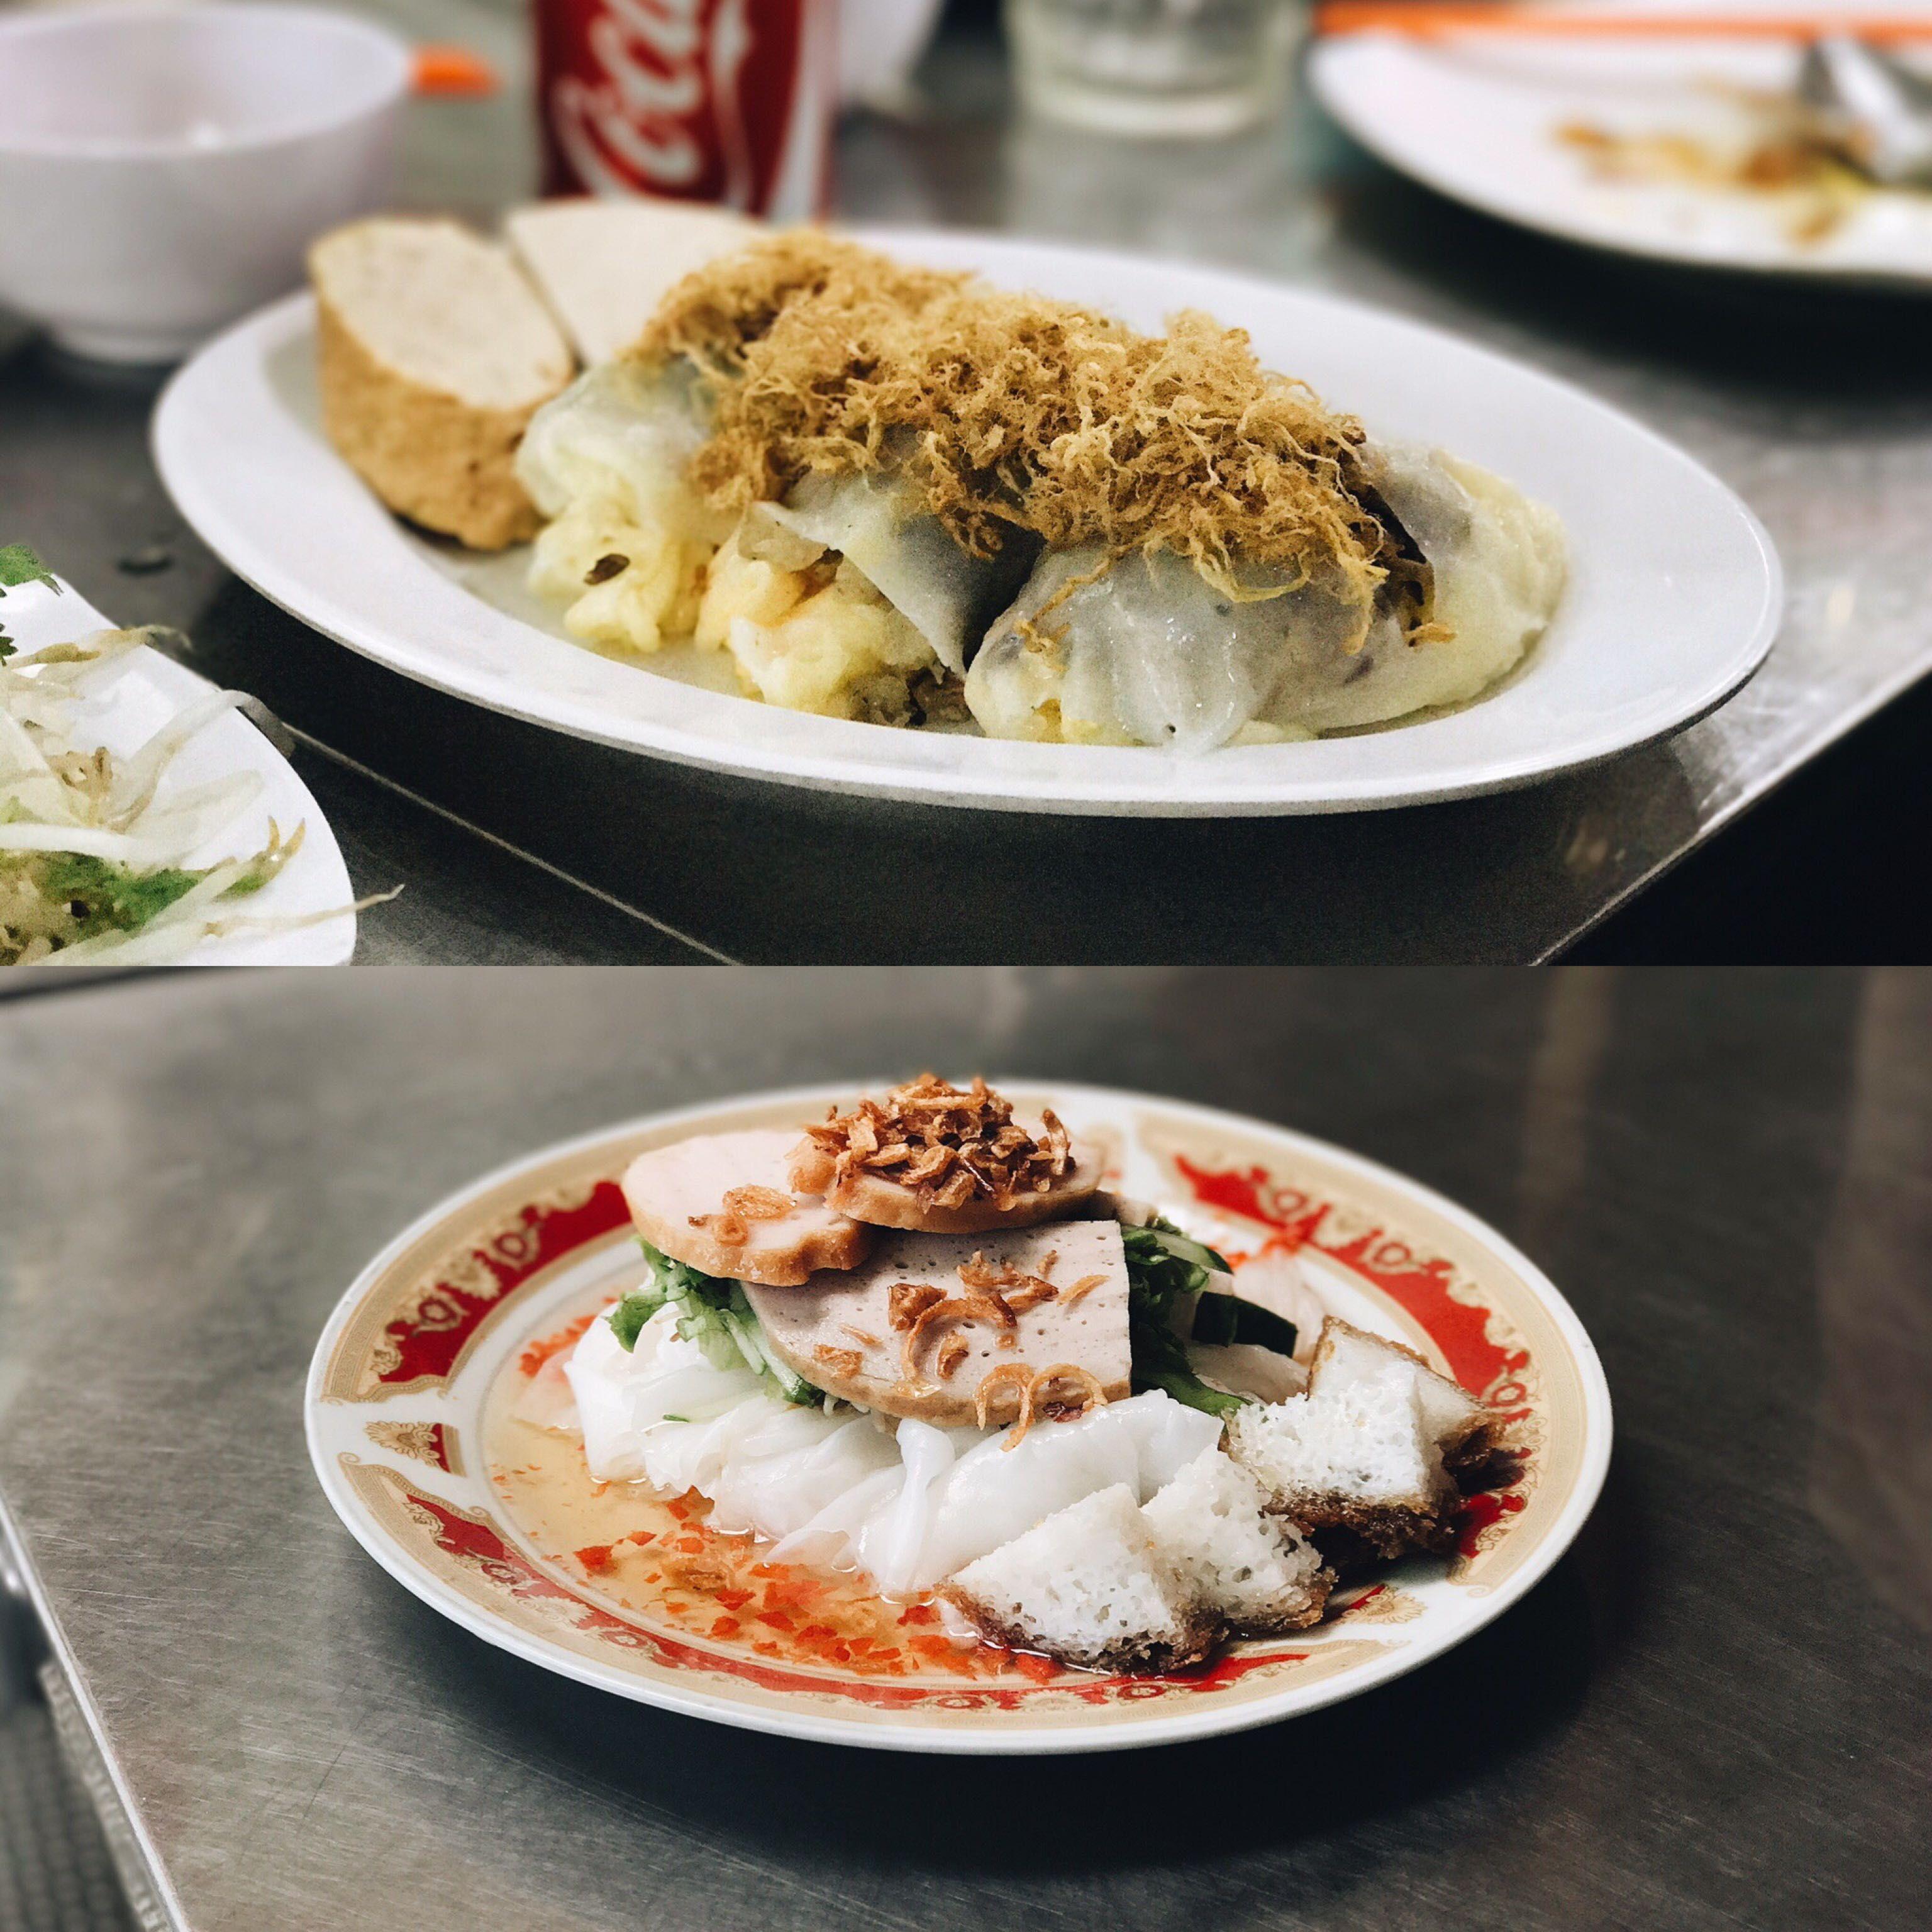 [I Ate] Banh Cuon & Banh Uot ($1 Vietnamese Steamed